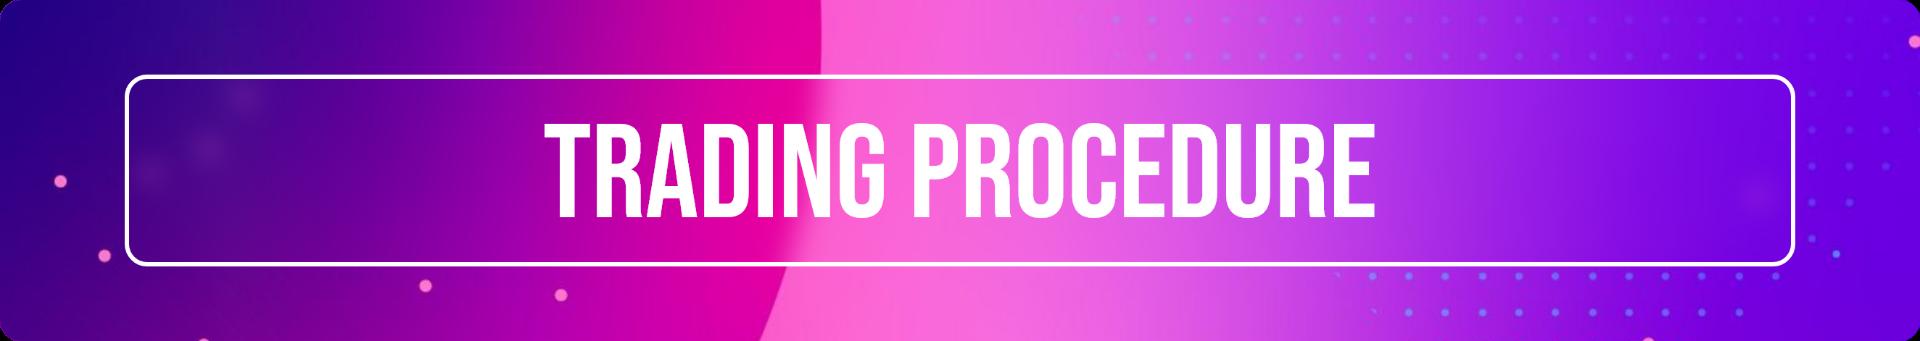 Star Hangar - Trading Procedure